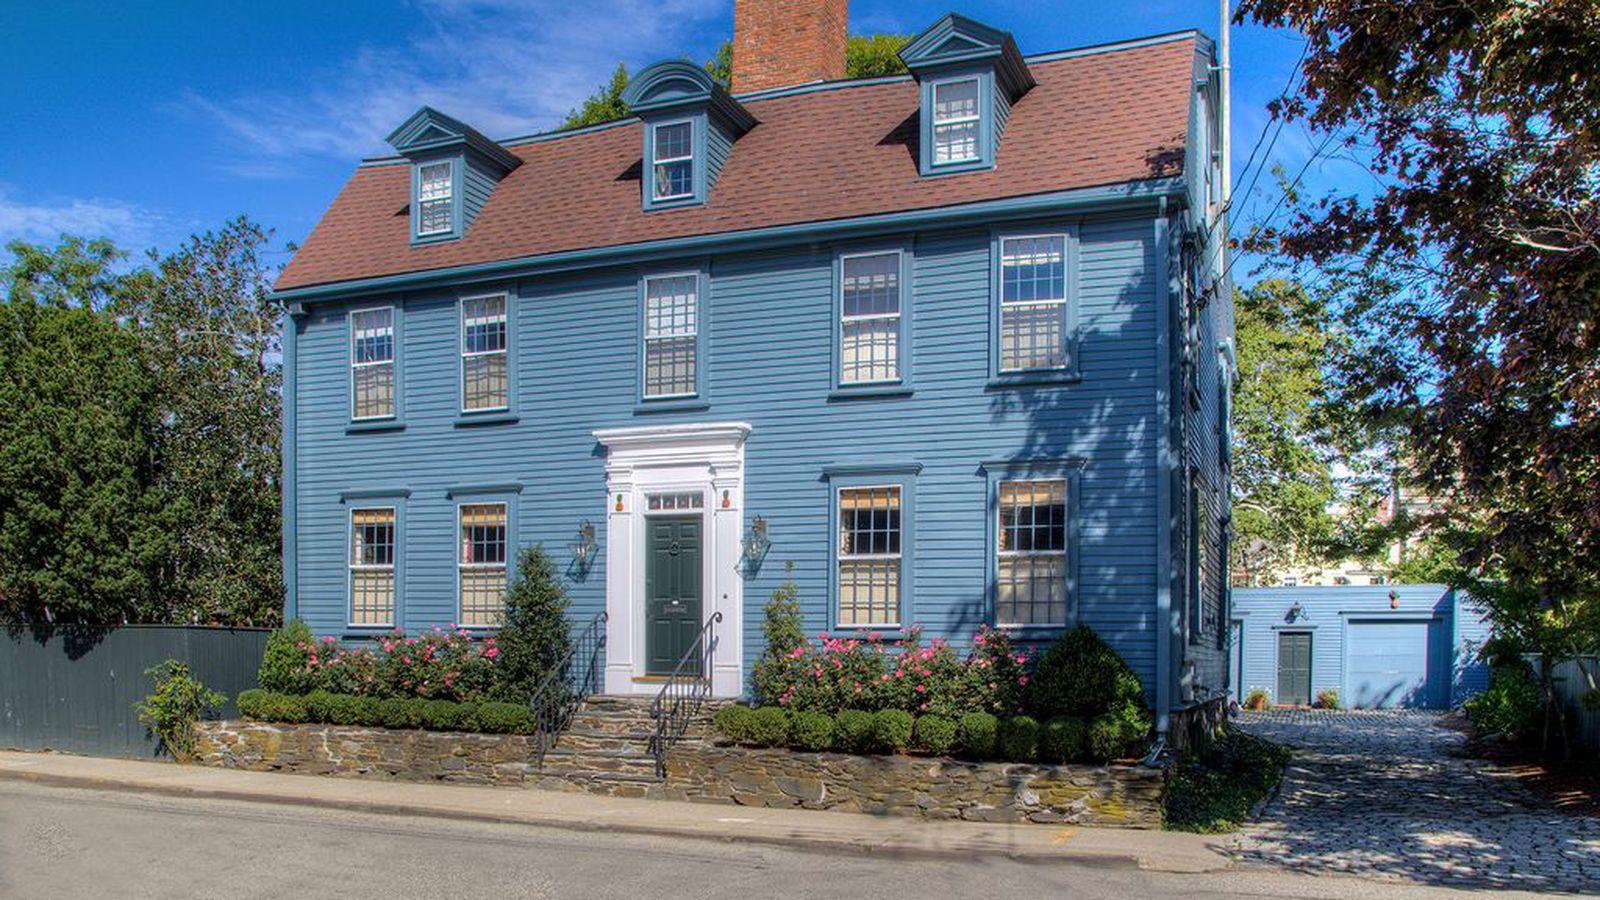 Elegant Newport Colonial Blocks From The Harbor Asks 1